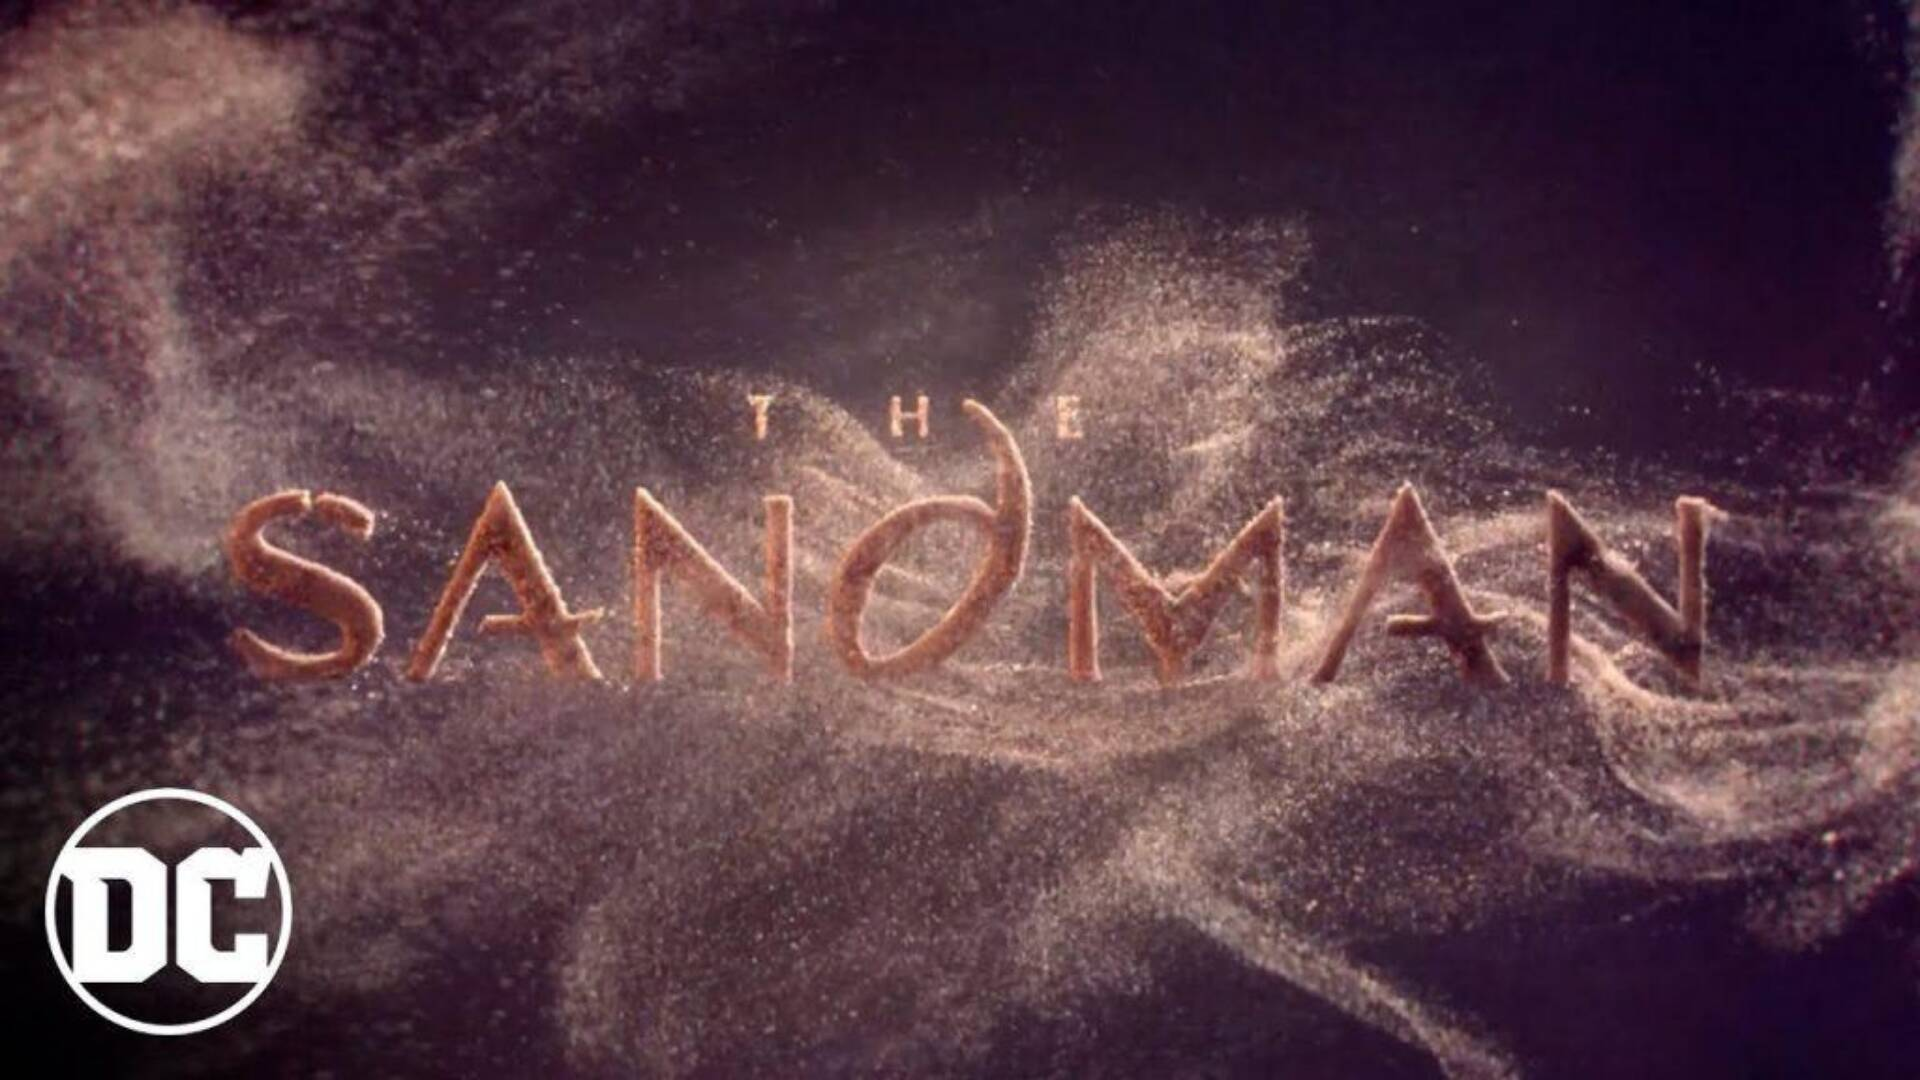 Sandman Netflix FanDome